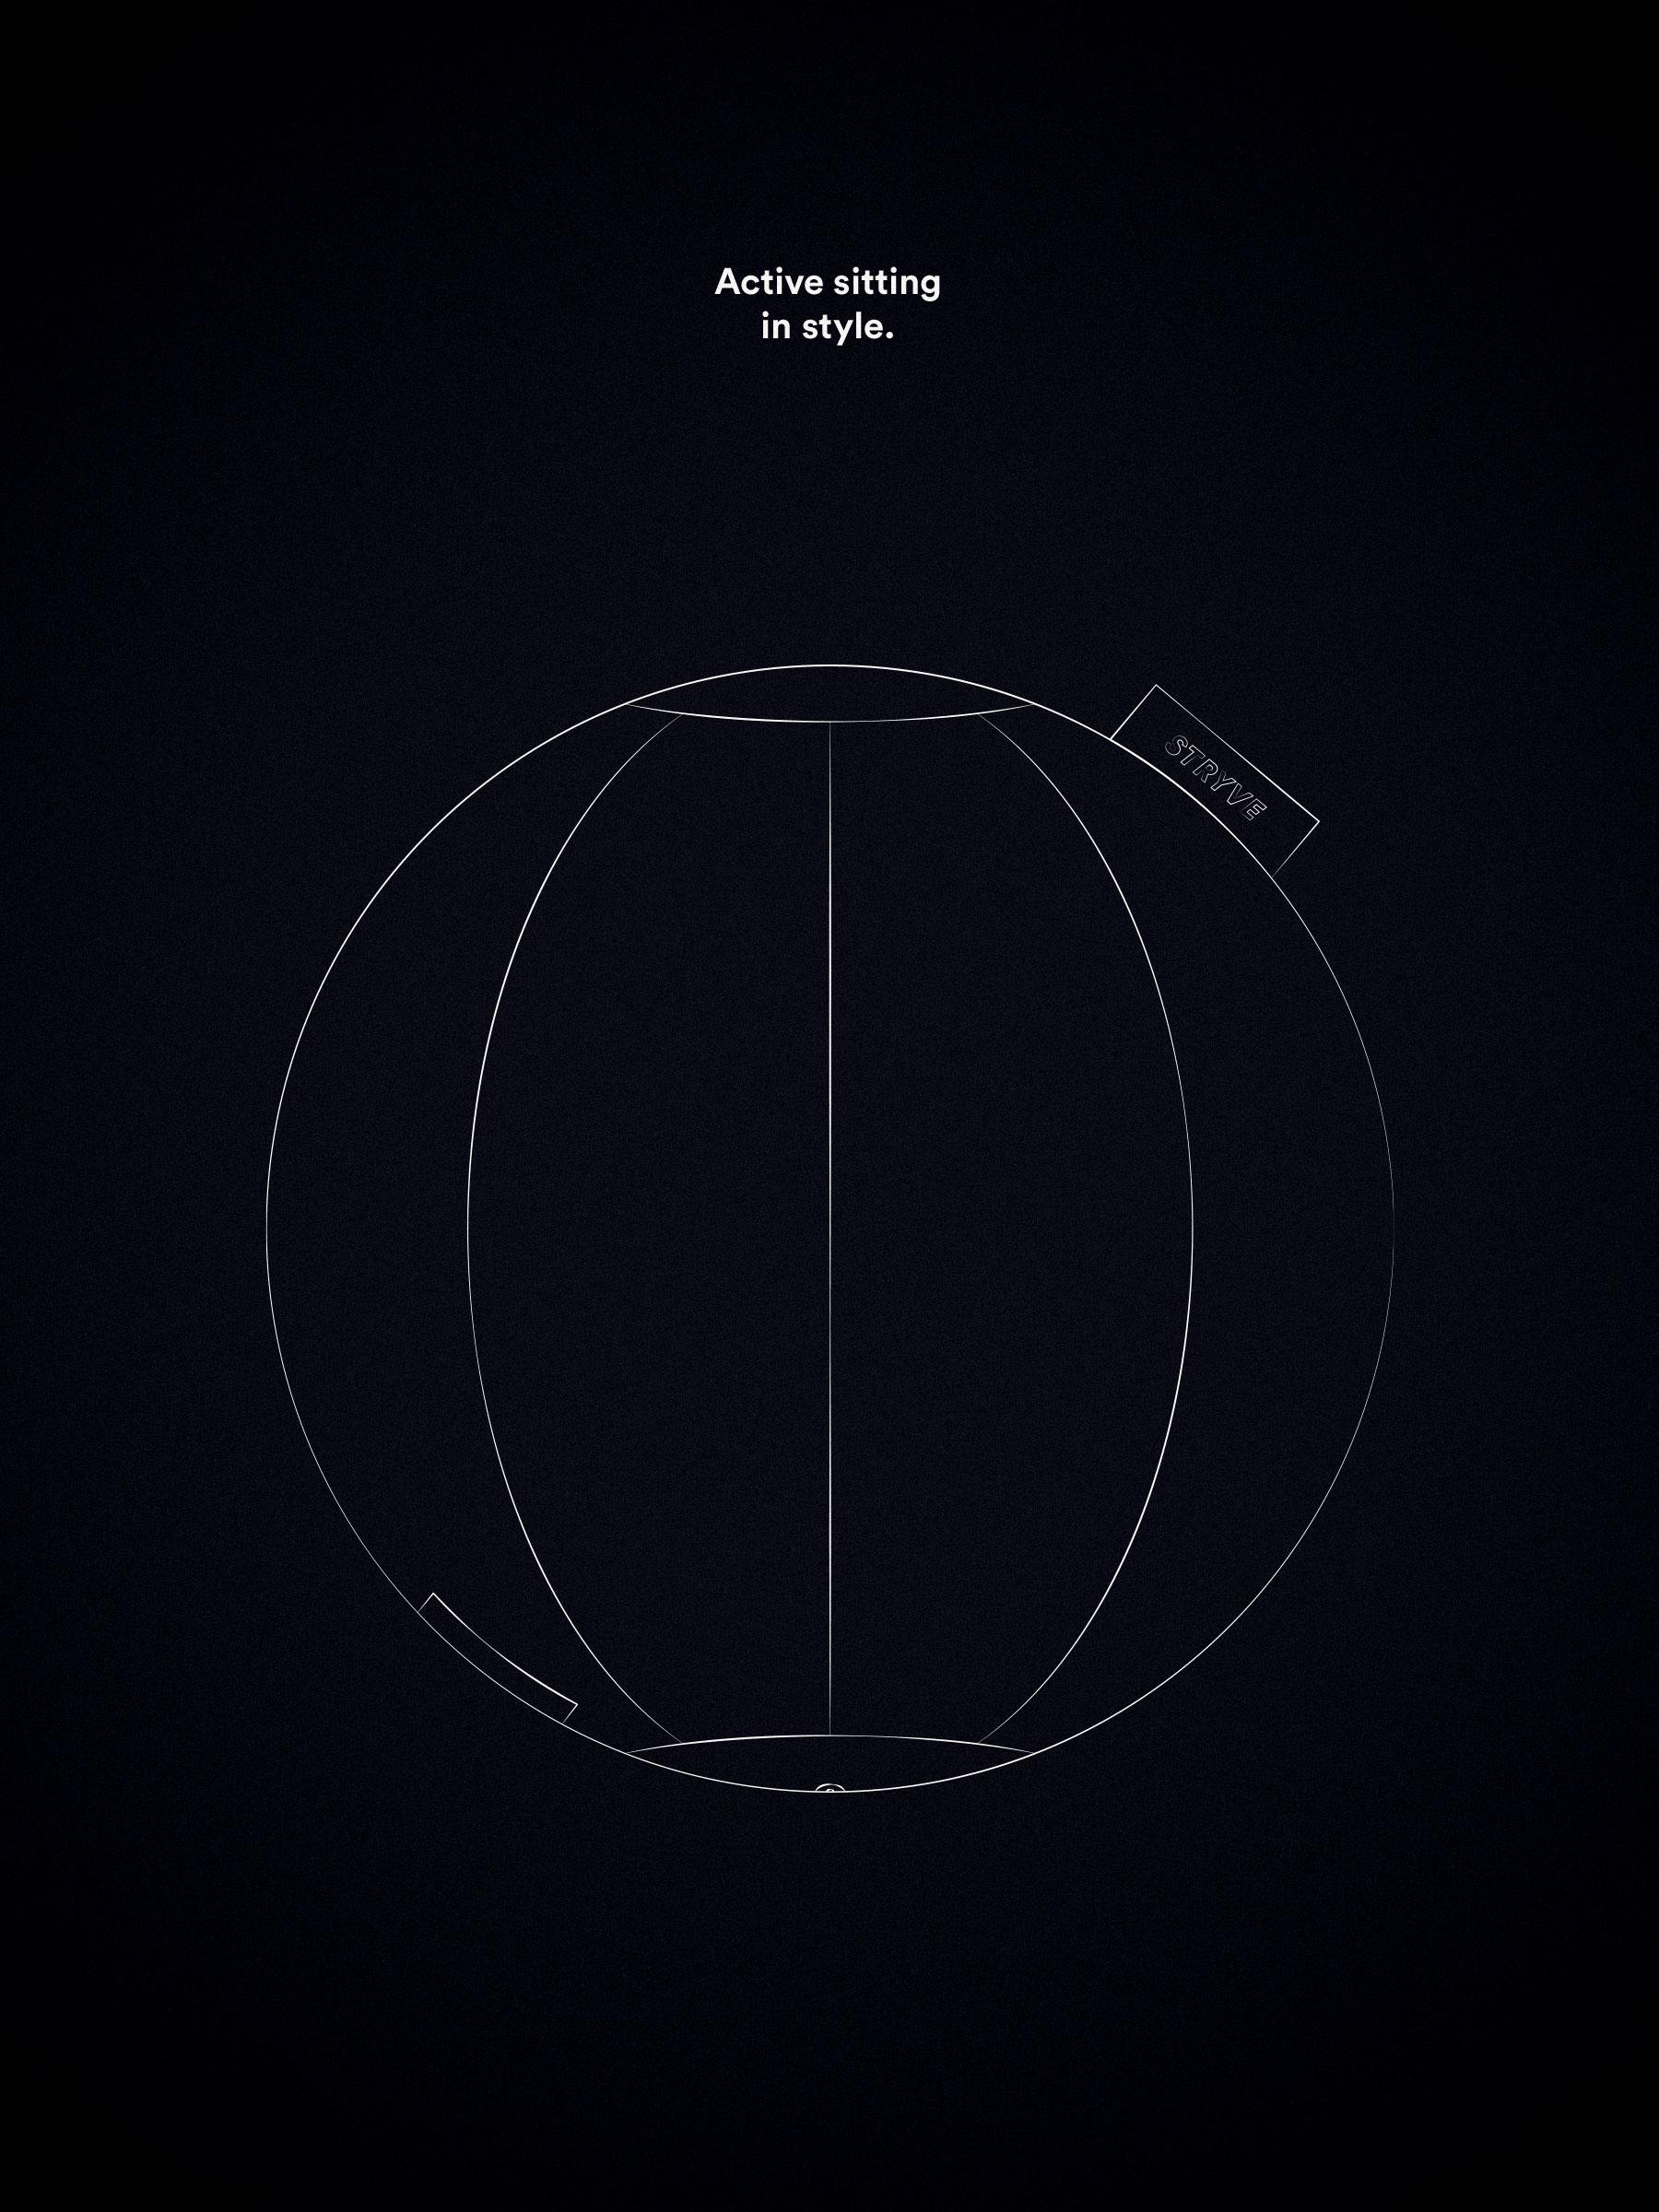 stryve-ball-design-produkt-grafik-kommunikation